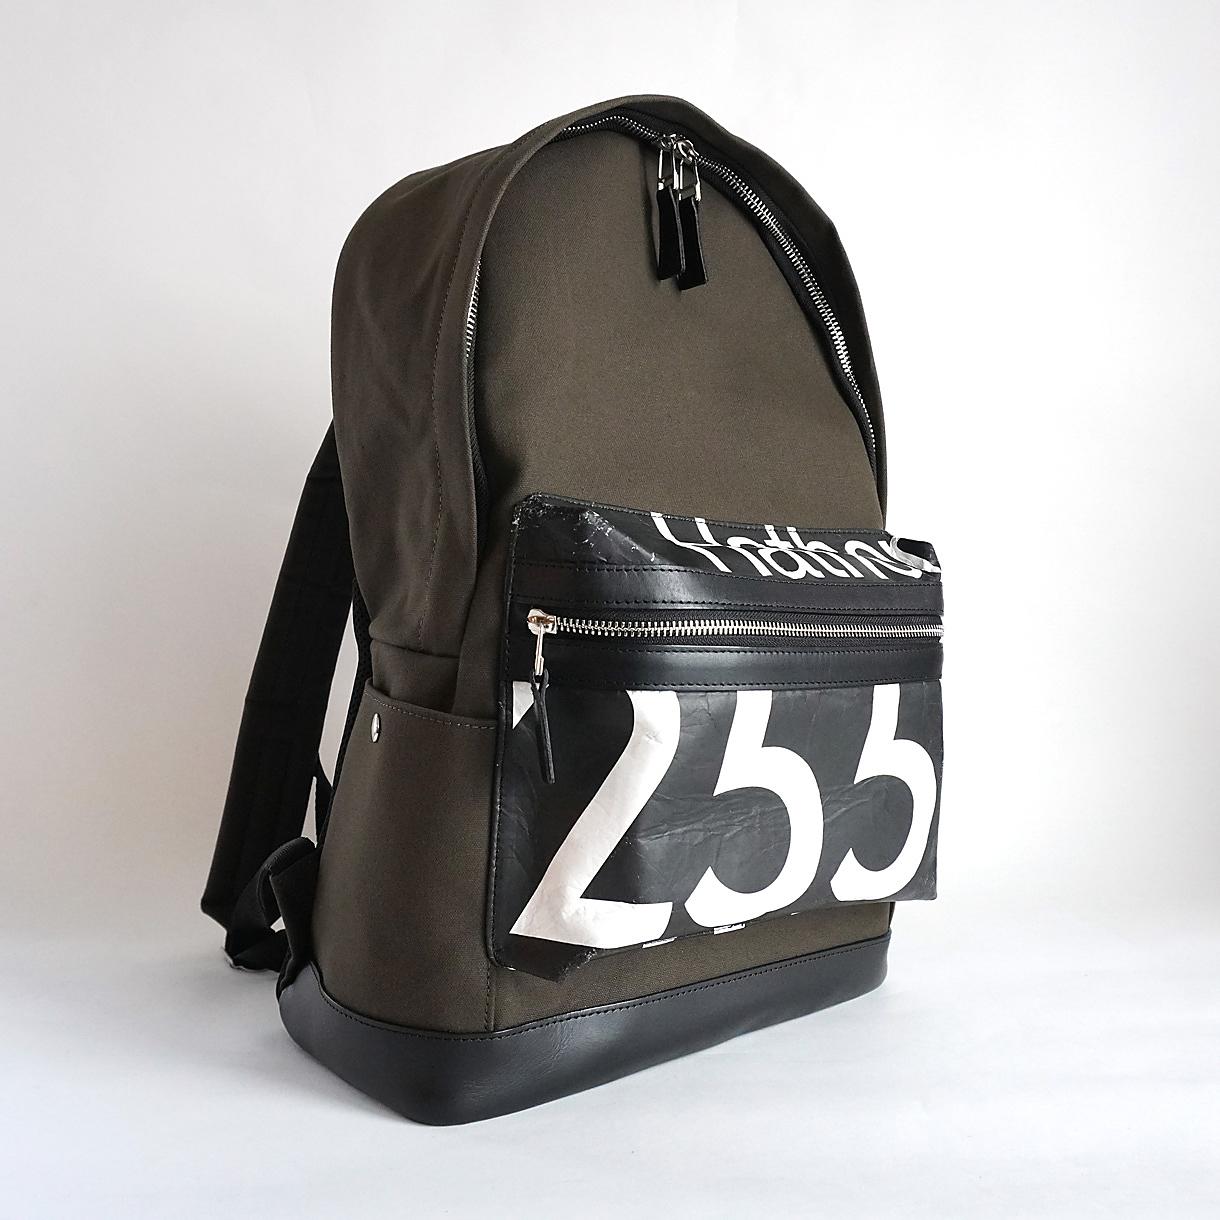 Backpack / BPA-0003